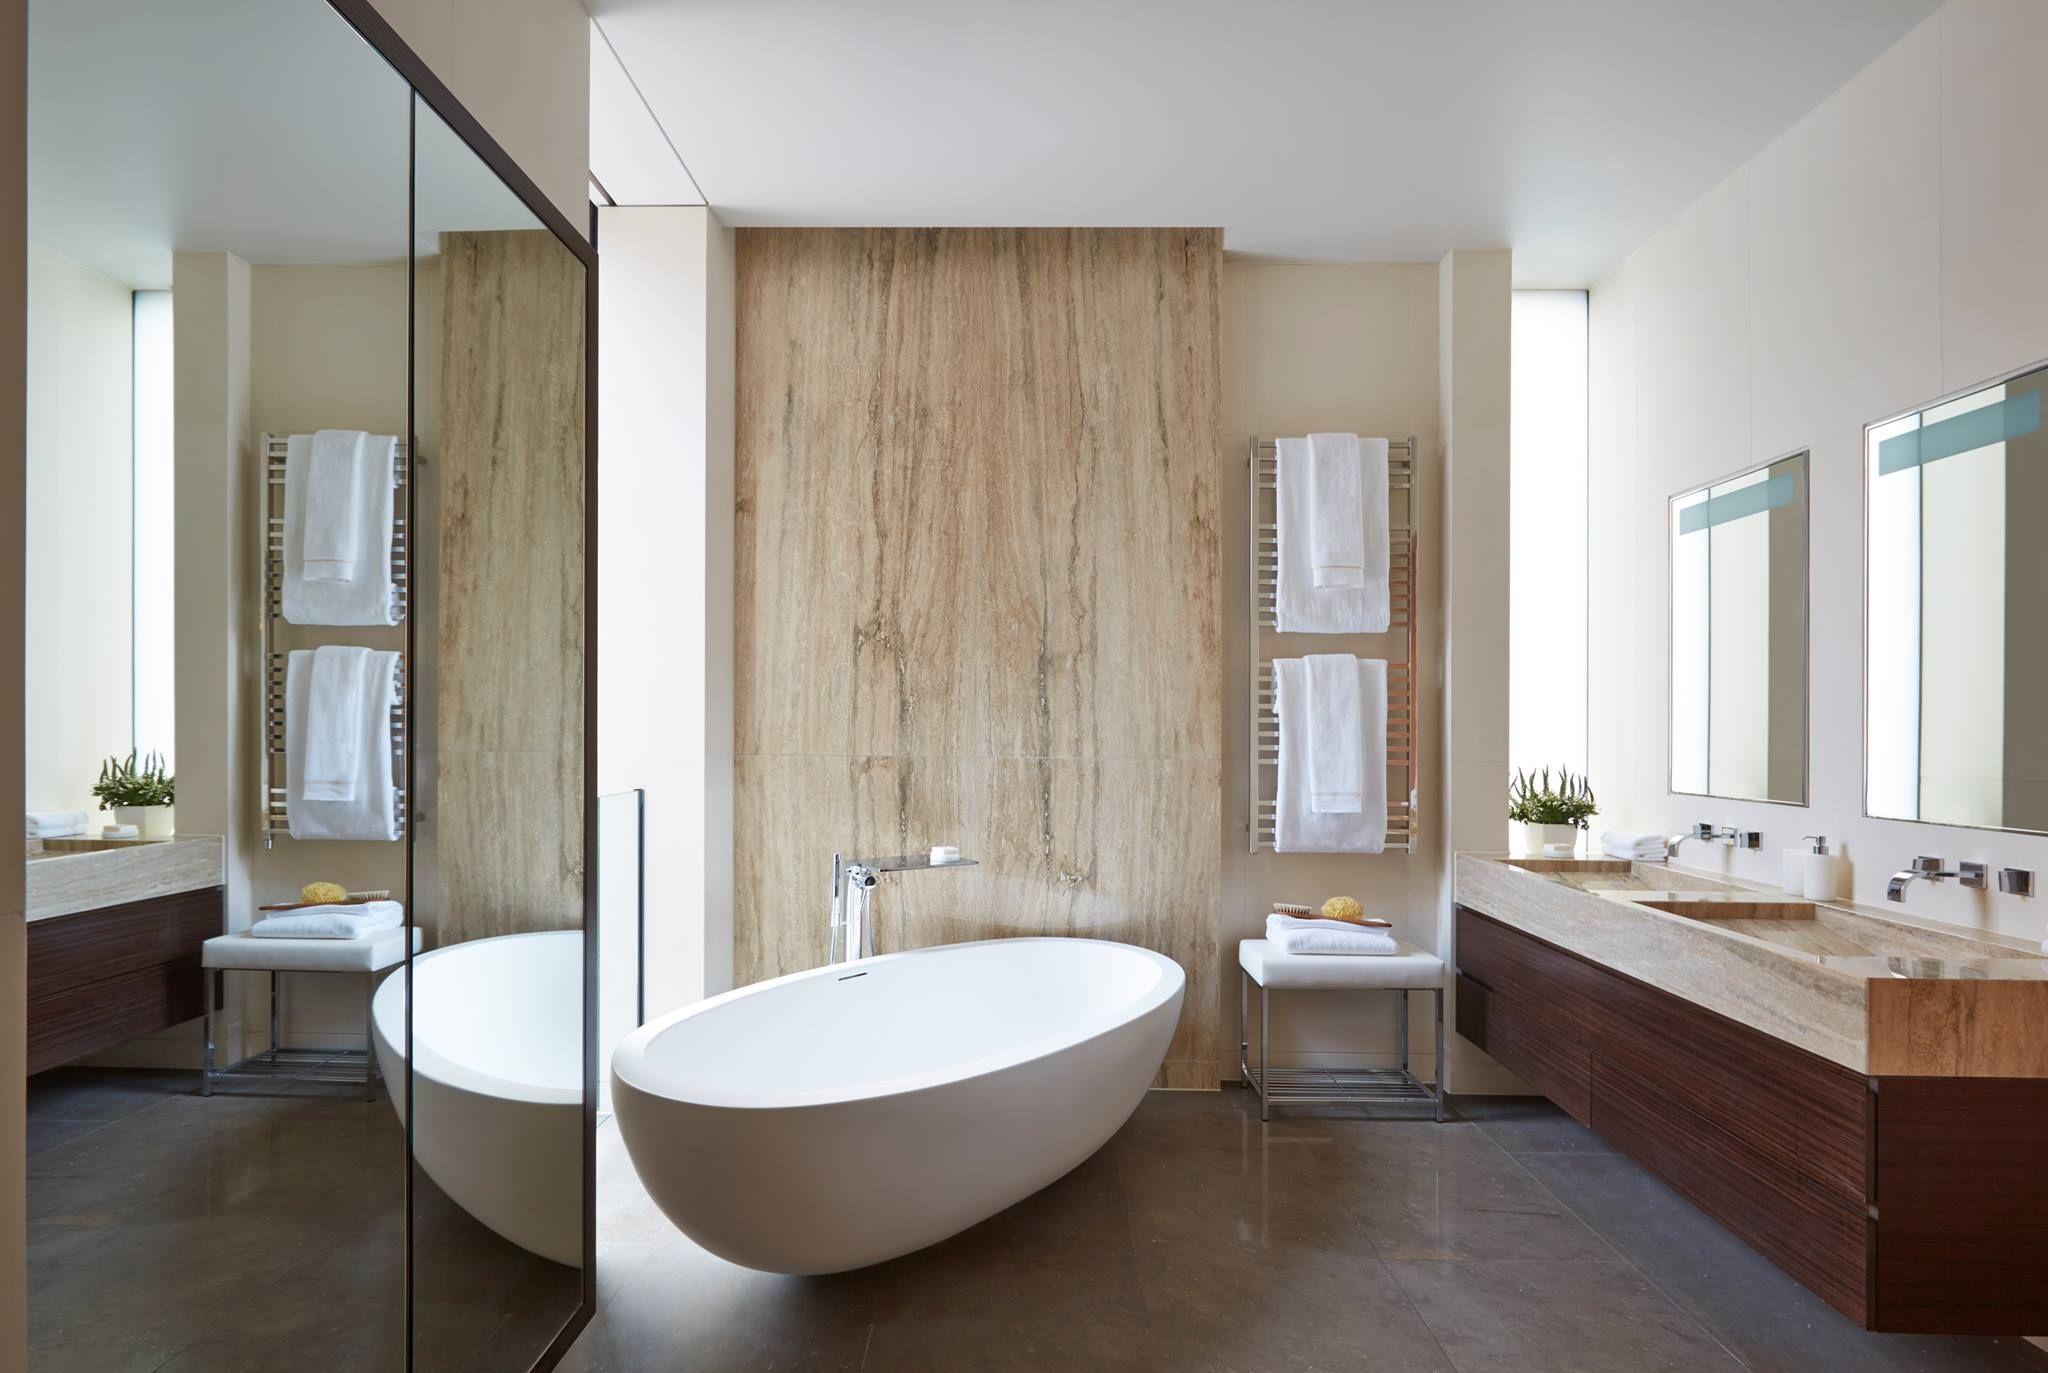 Helen Green Design With Images Luxury Bathroom Bathroom Decor Luxury Top Bathroom Design Famous concept bathroom ideas